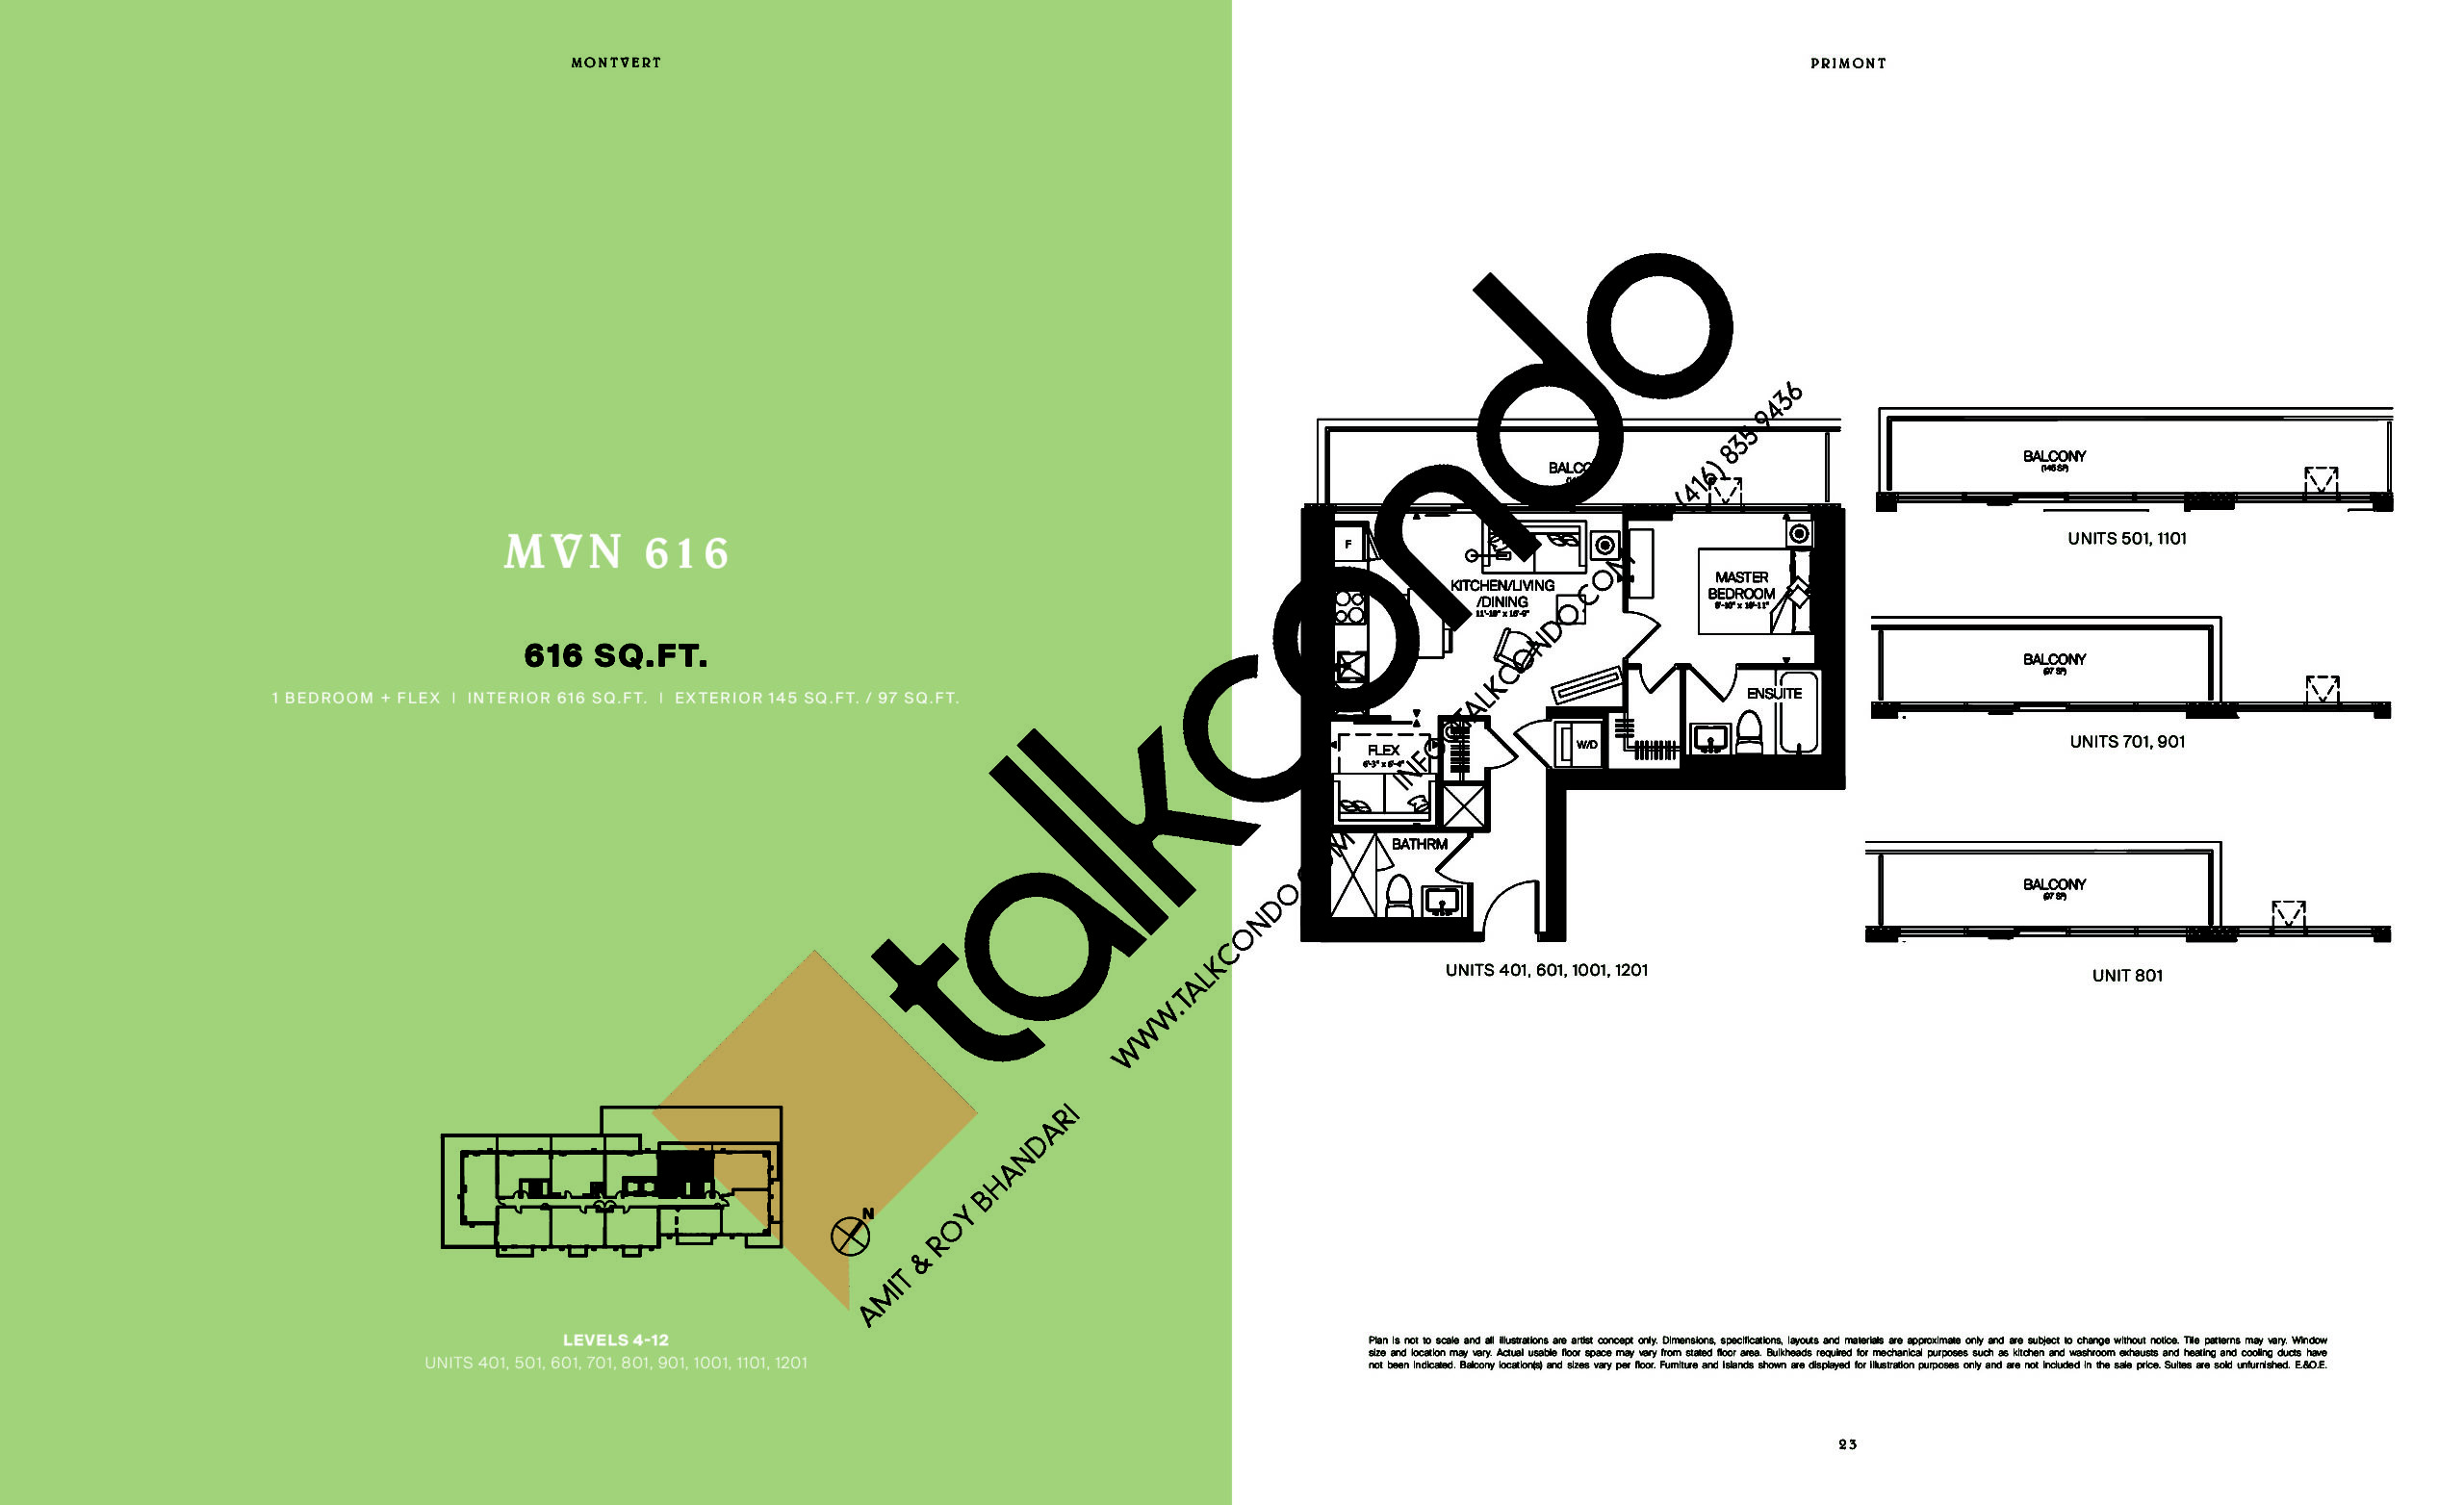 MVN 616 Floor Plan at MontVert Condos - 616 sq.ft